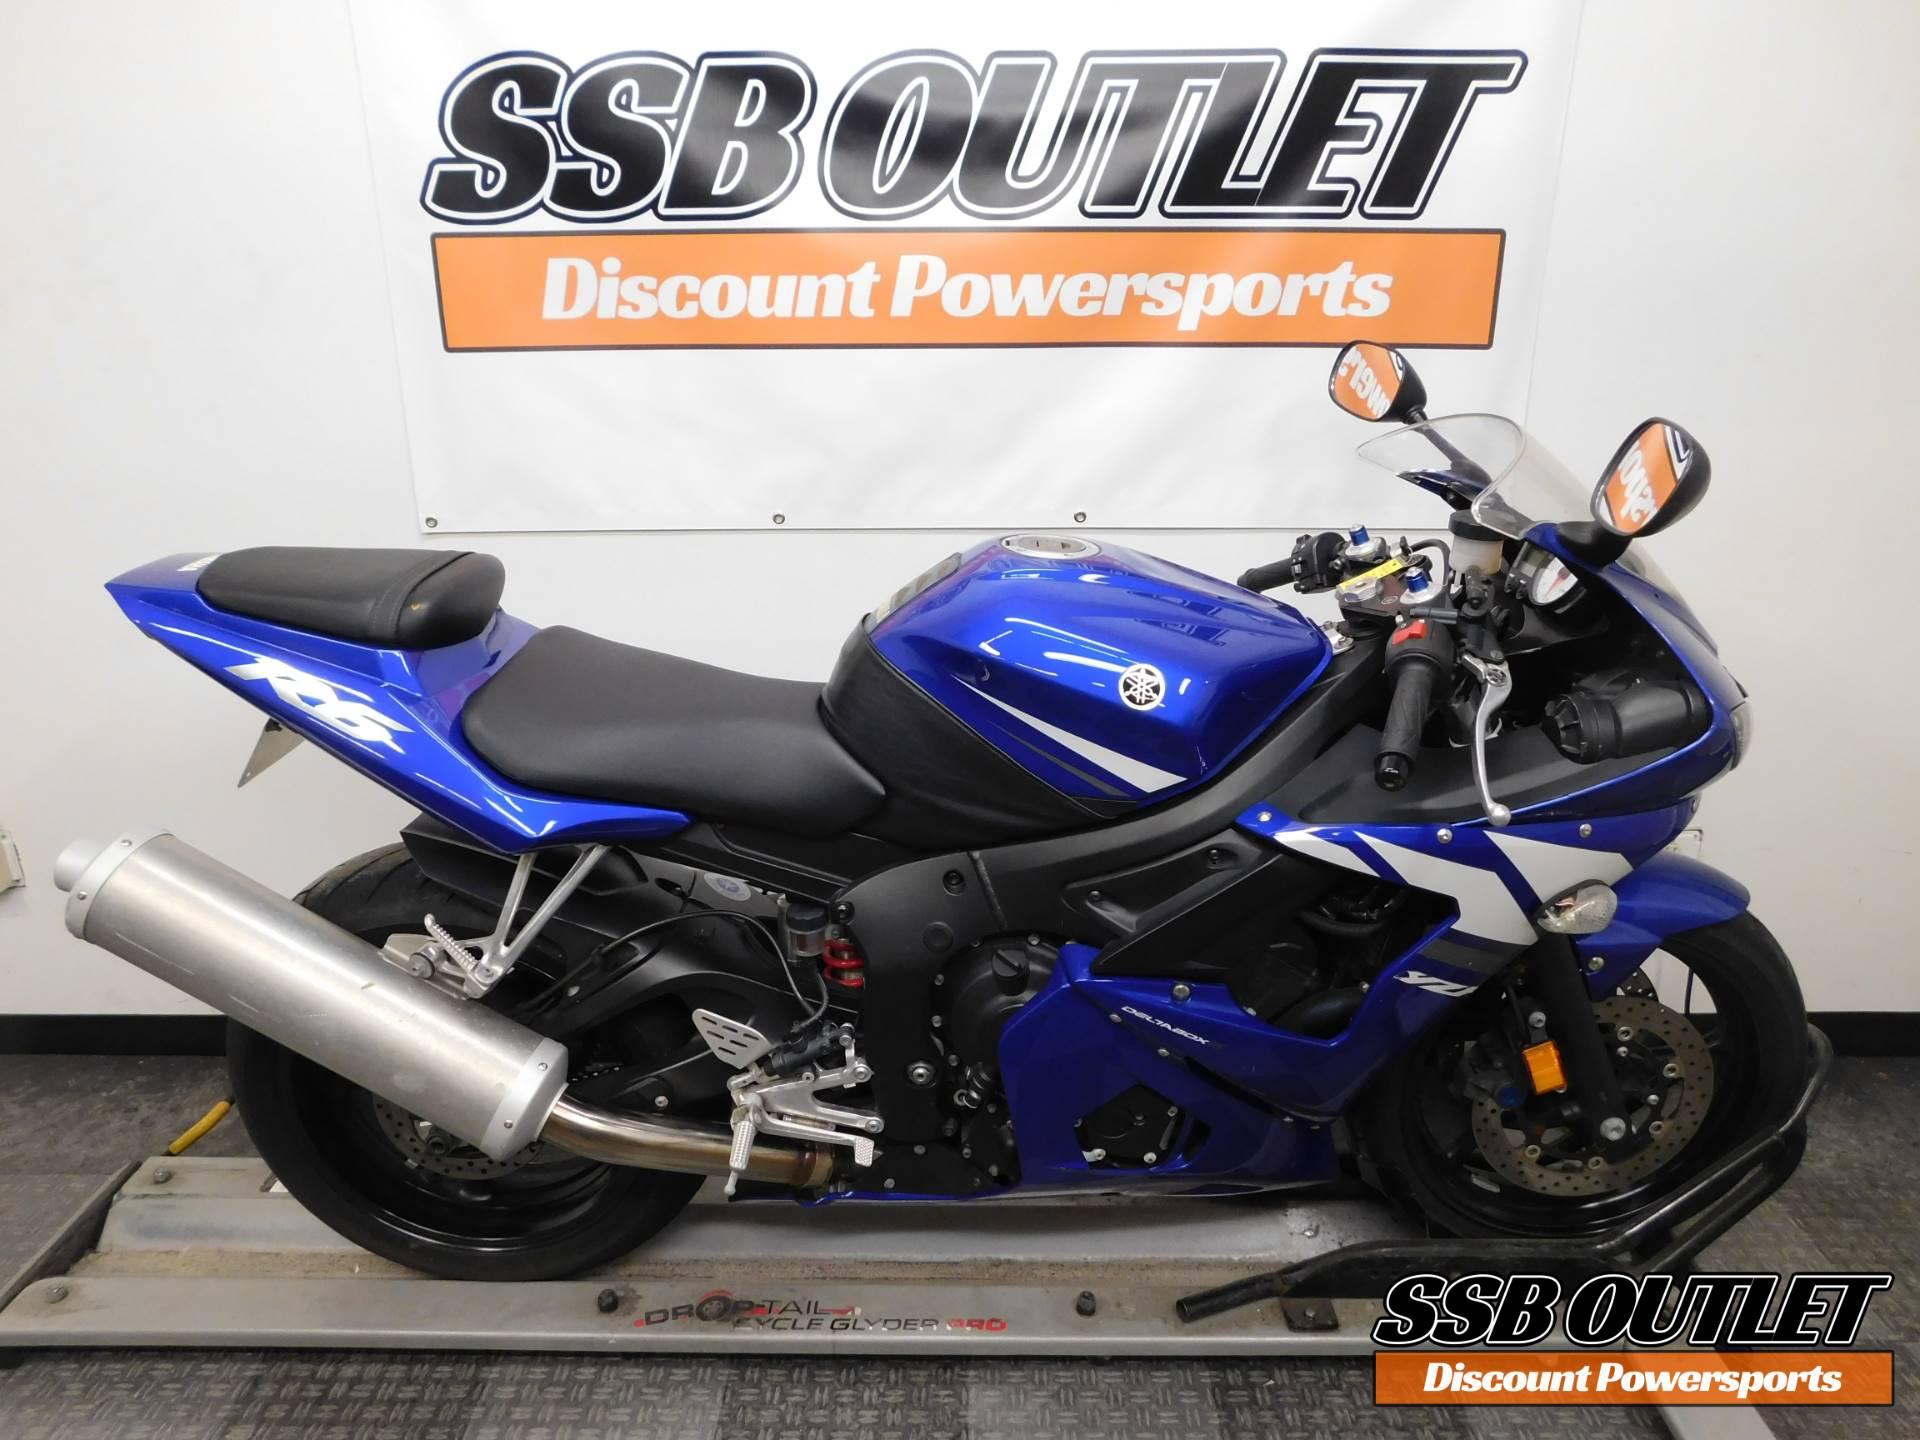 2003 Yamaha YZF-R6 for sale 129597